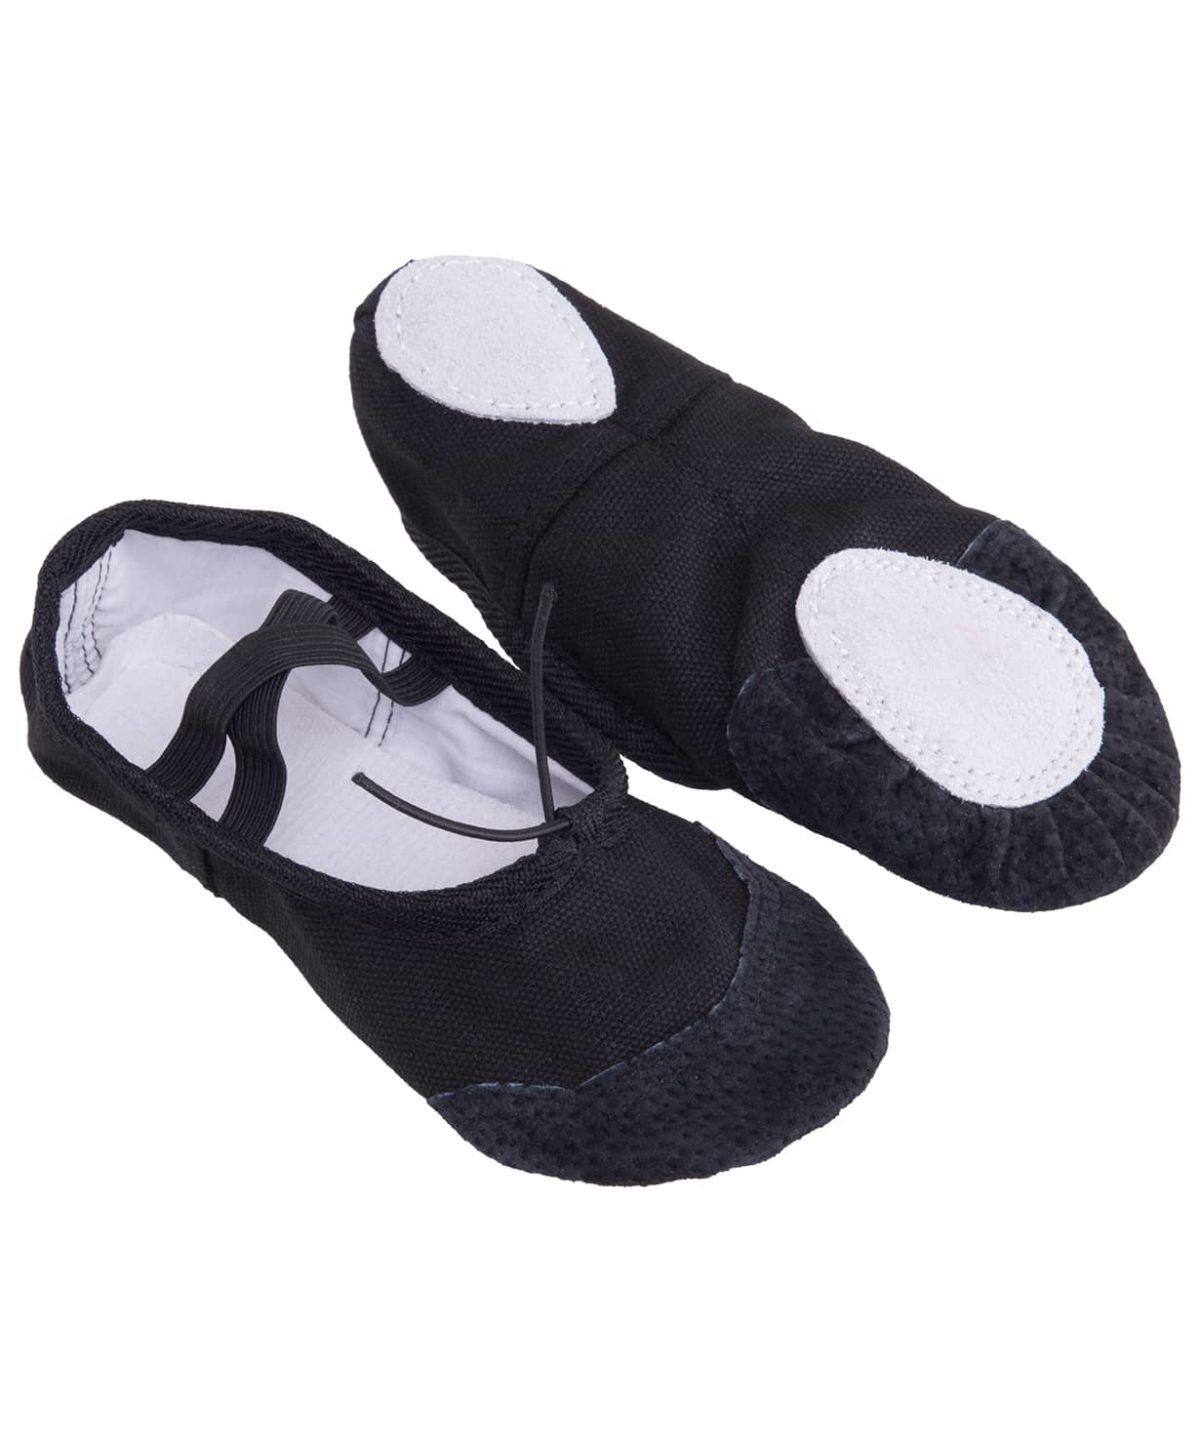 AMELY Балетки текстиль (24-26) SL-01: чёрный - 1